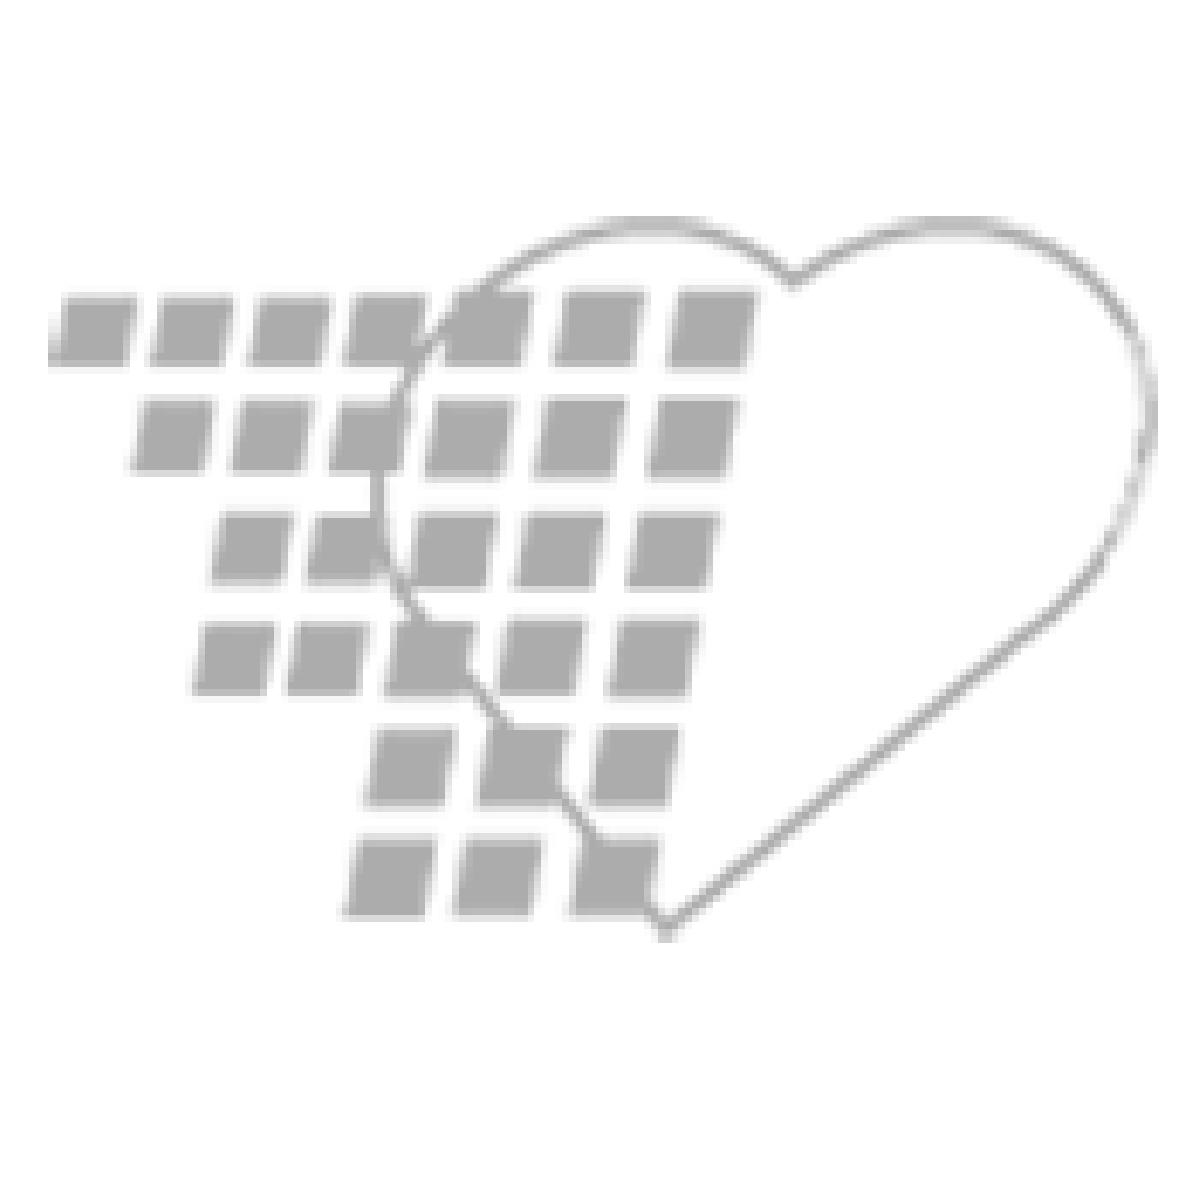 05-87-3102 ULTRAFLEX®Male External Catheter (Texas Catheter)